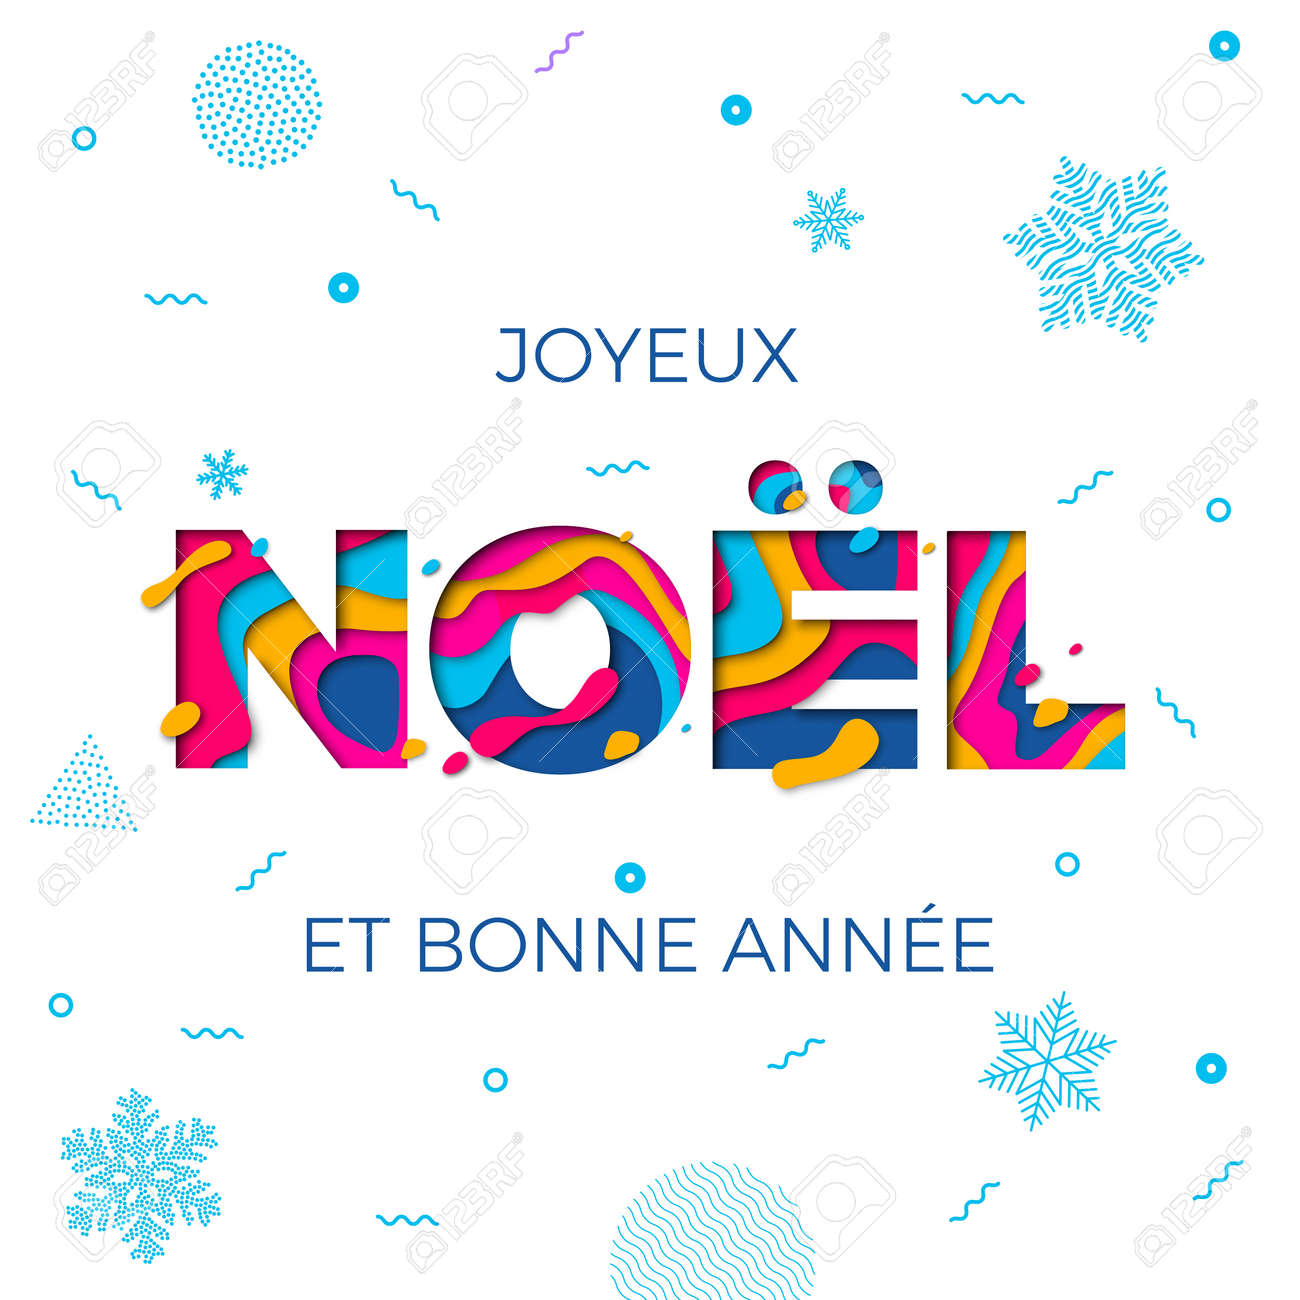 Joyeux Noel Merry Christmas French Greeting Card Background ...